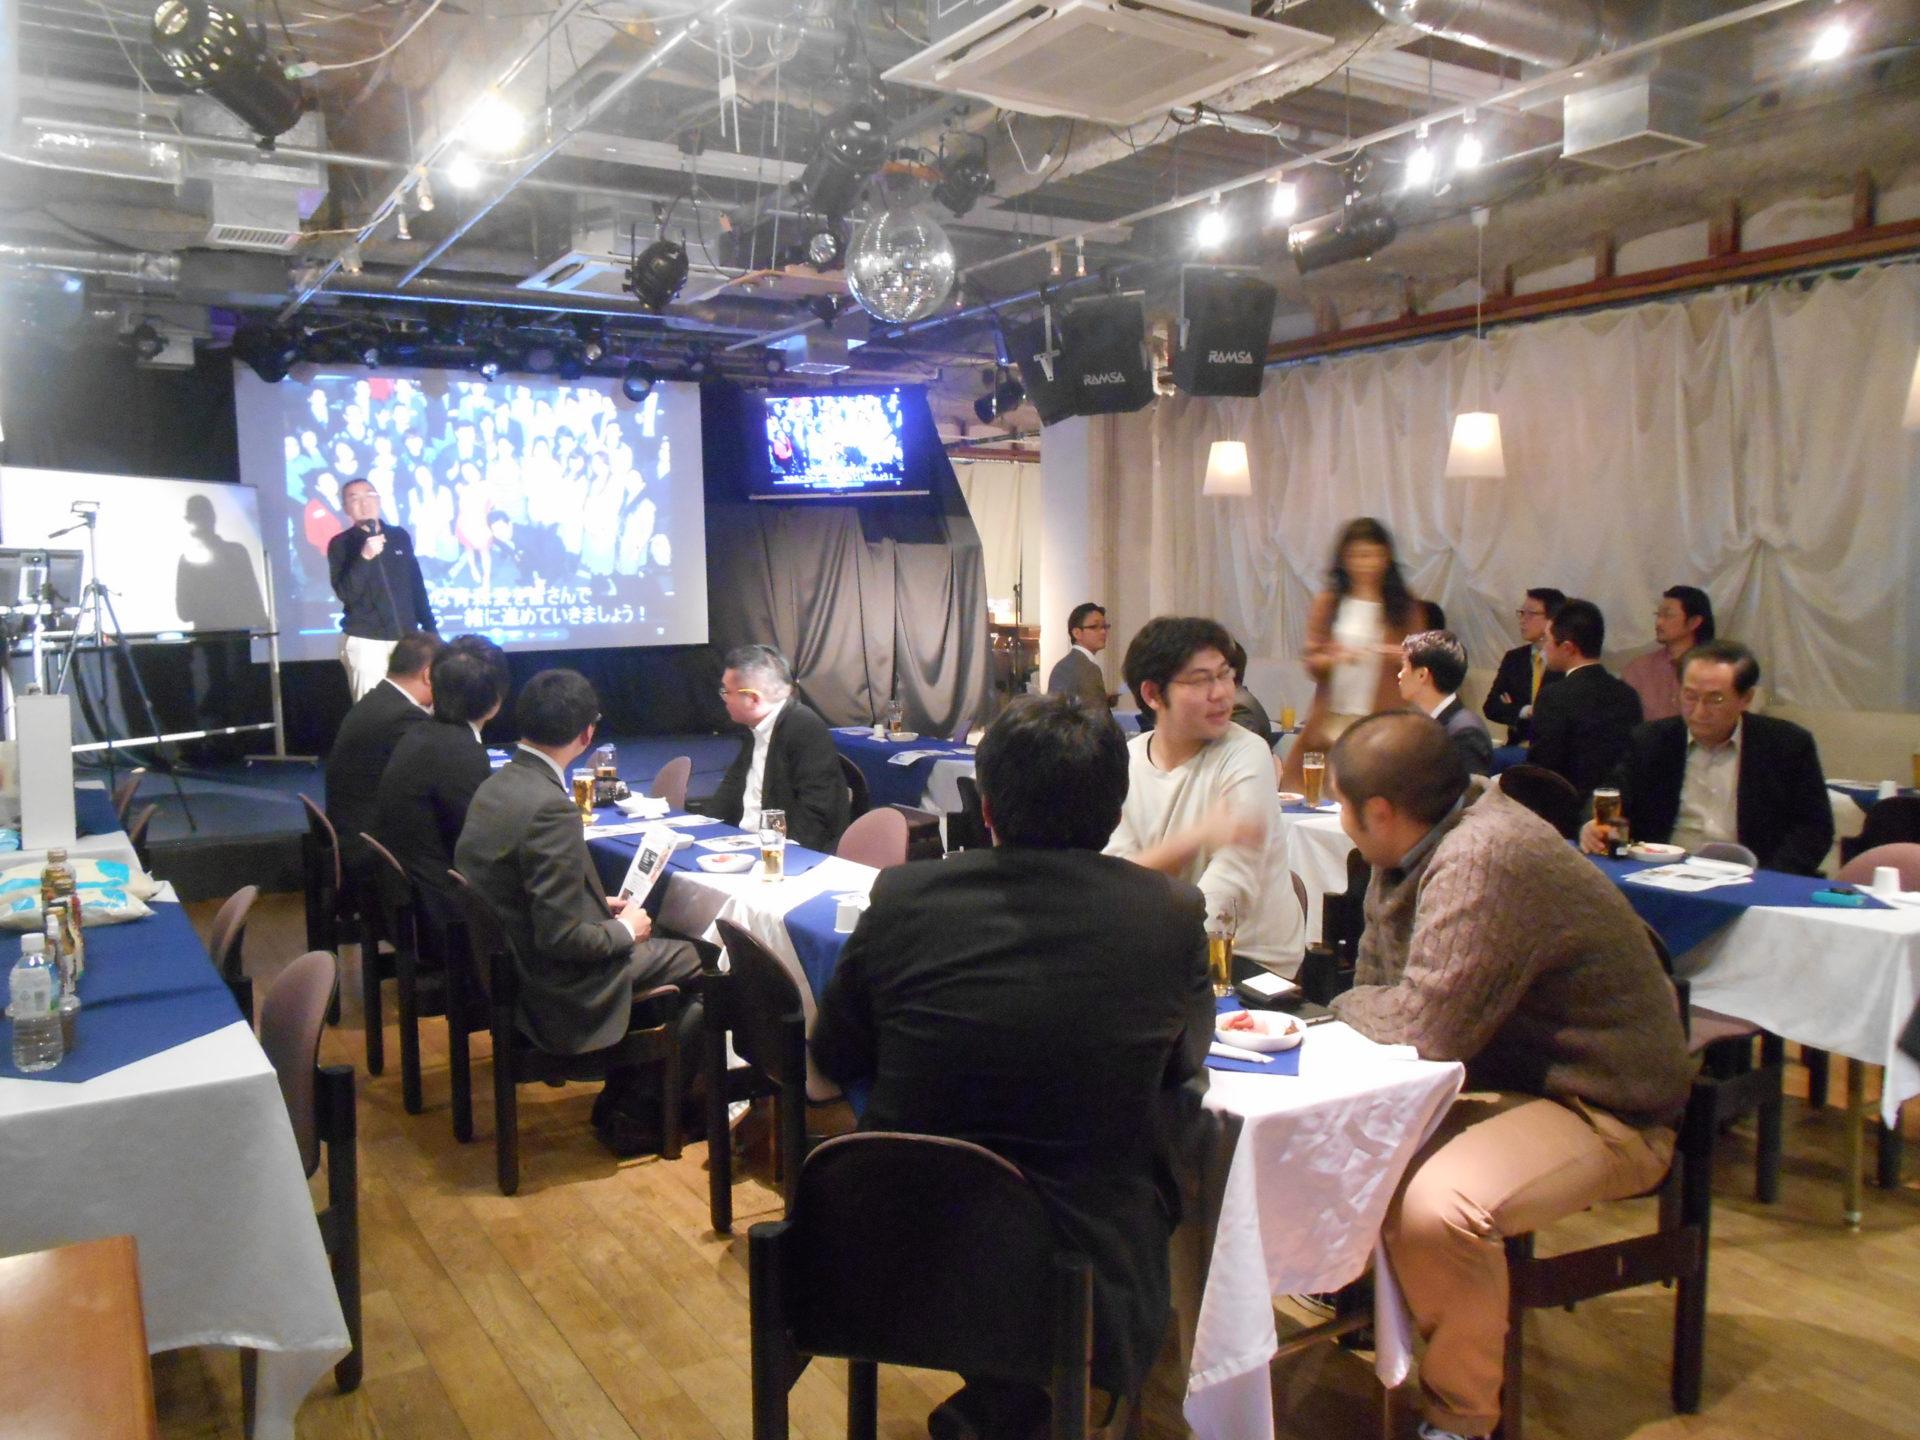 DSCN1059 1920x1440 - 2016年3月11日(金)AOsuki総会&パーティー開催しました。